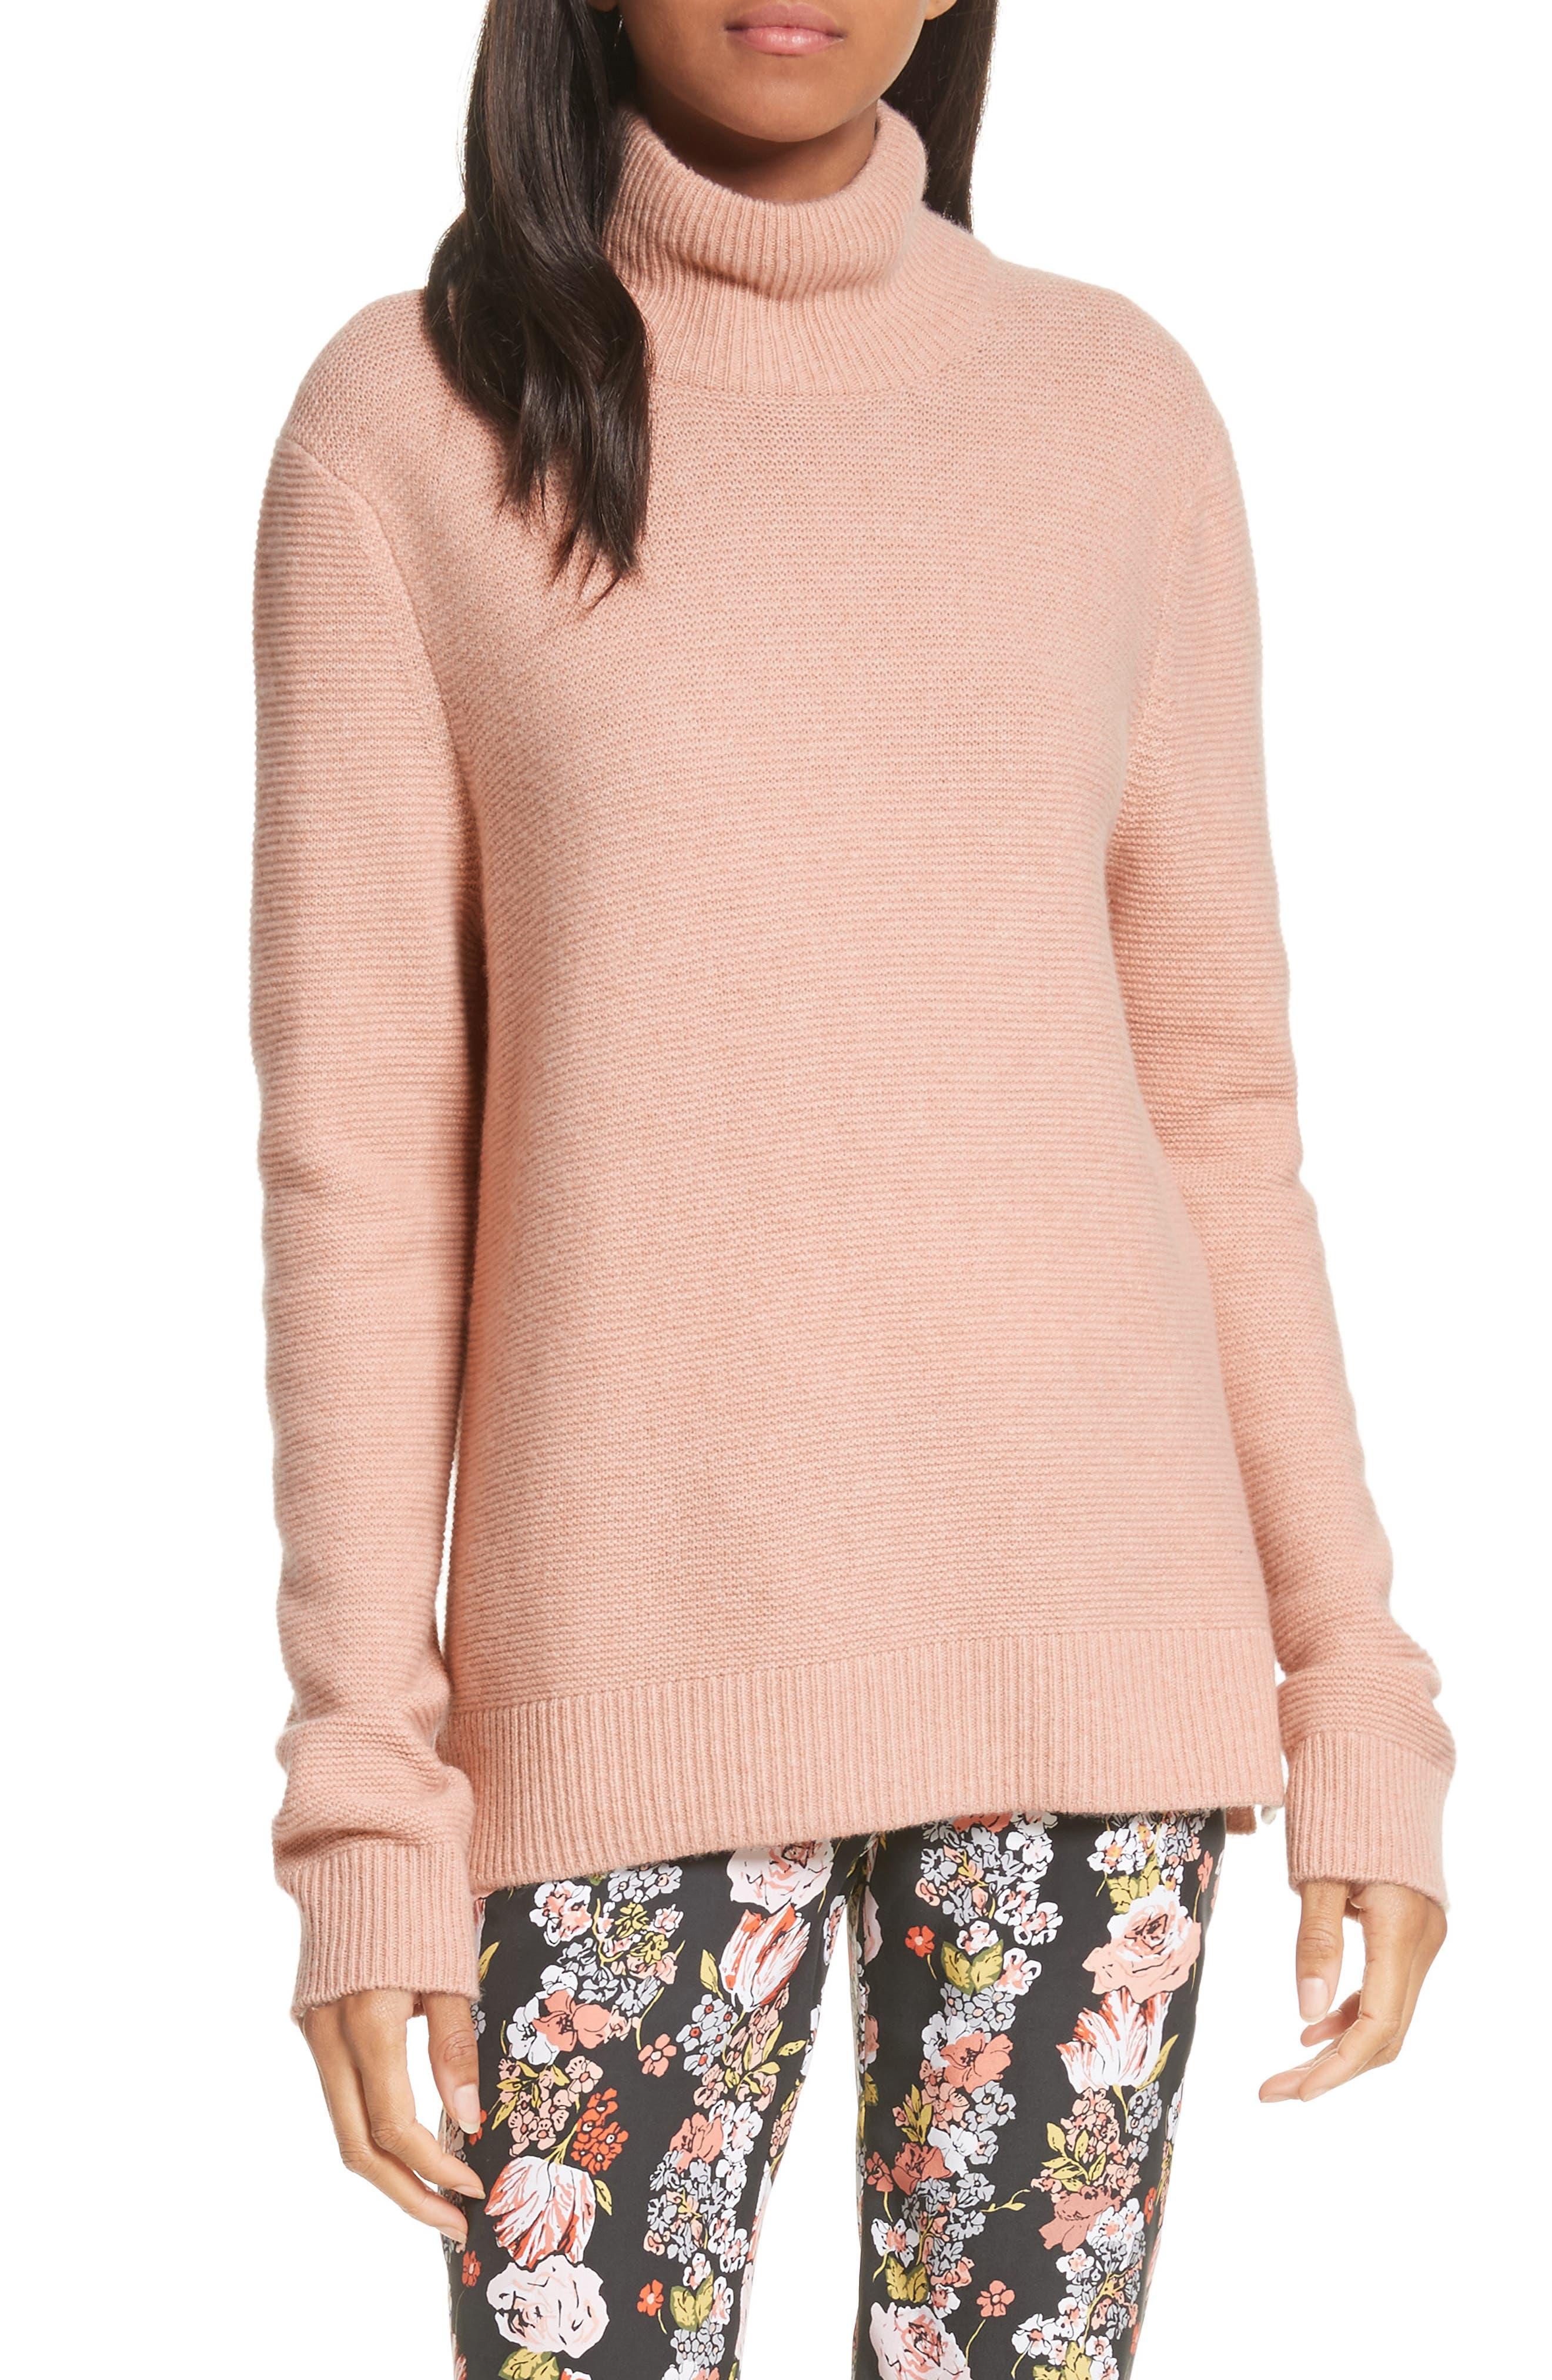 Alternate Image 1 Selected - Equipment Chandler Wool-Blend Turtleneck Sweater